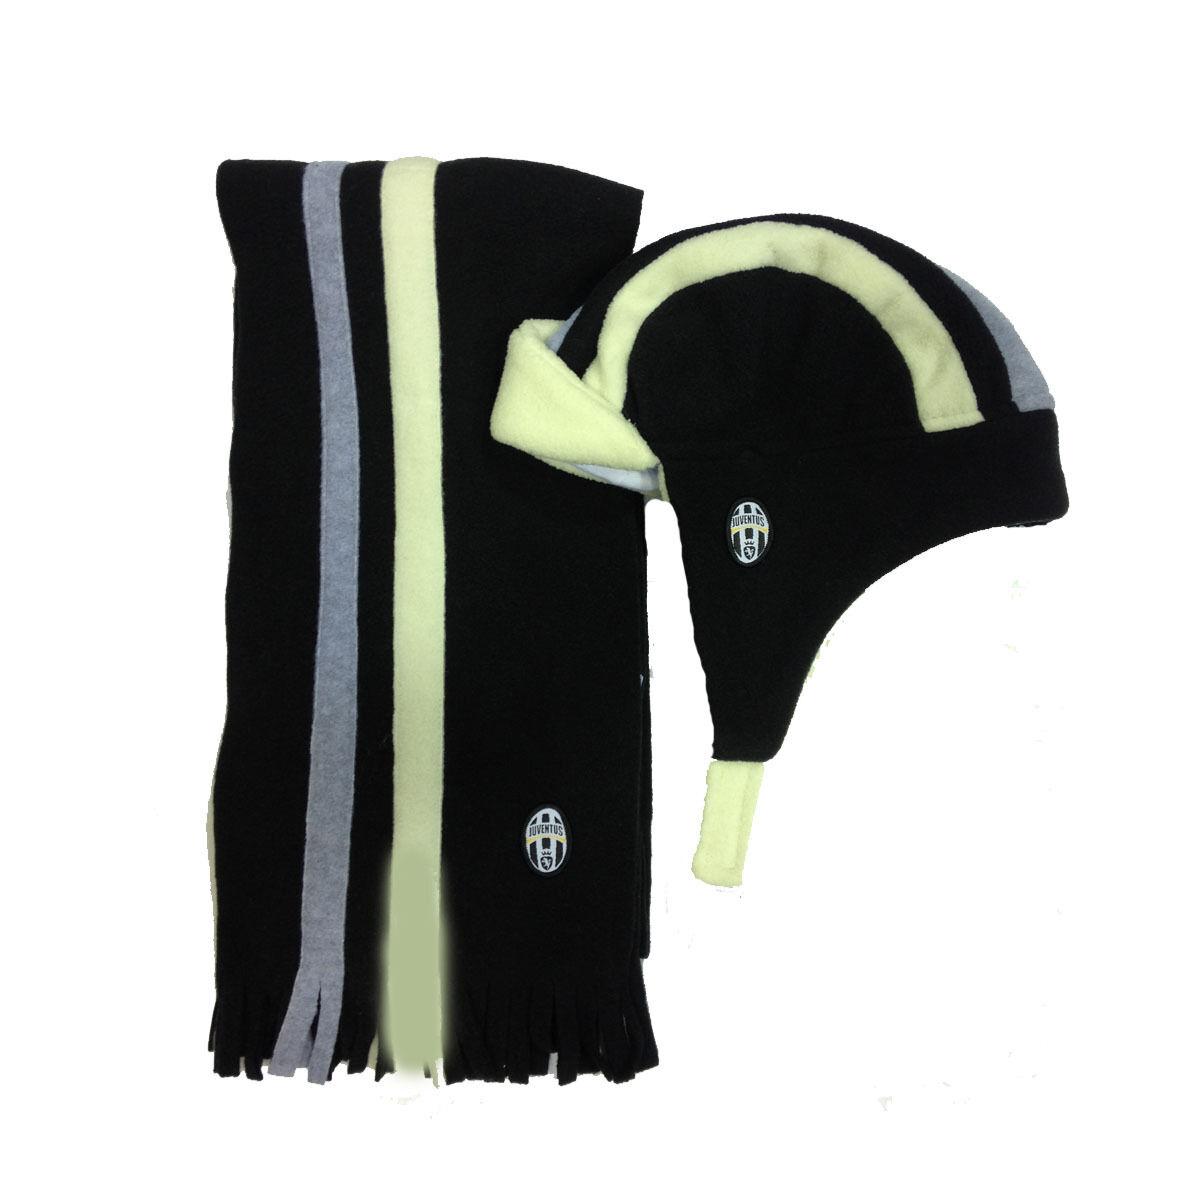 JUVENTUS set sciarpa+cappello nero con paraorecchie in morbido pile da bambino